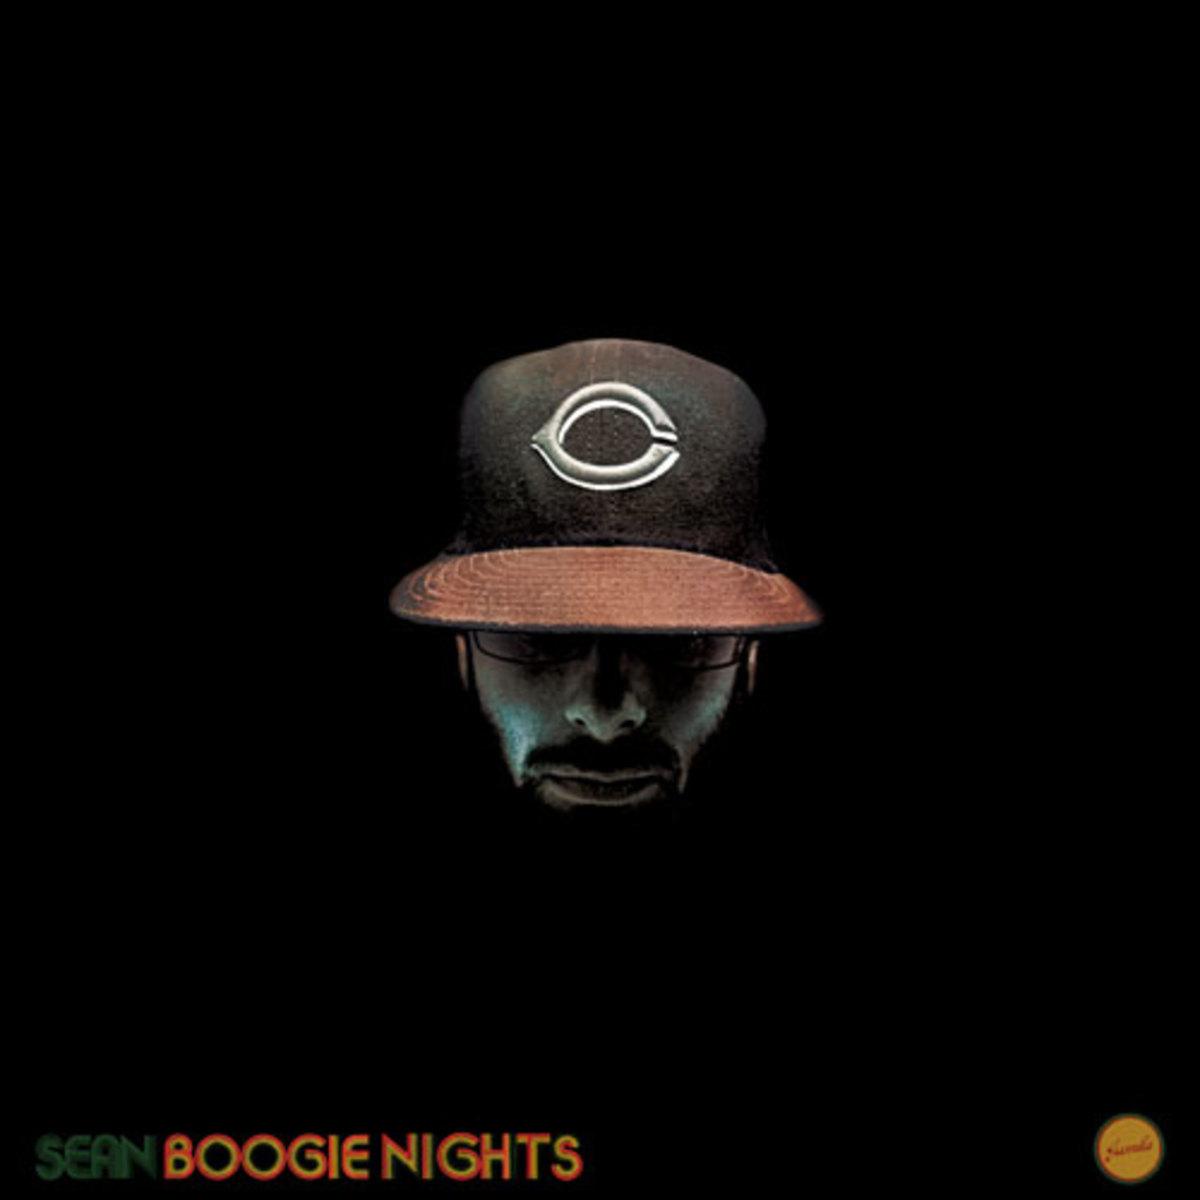 seanboog-nights.jpg